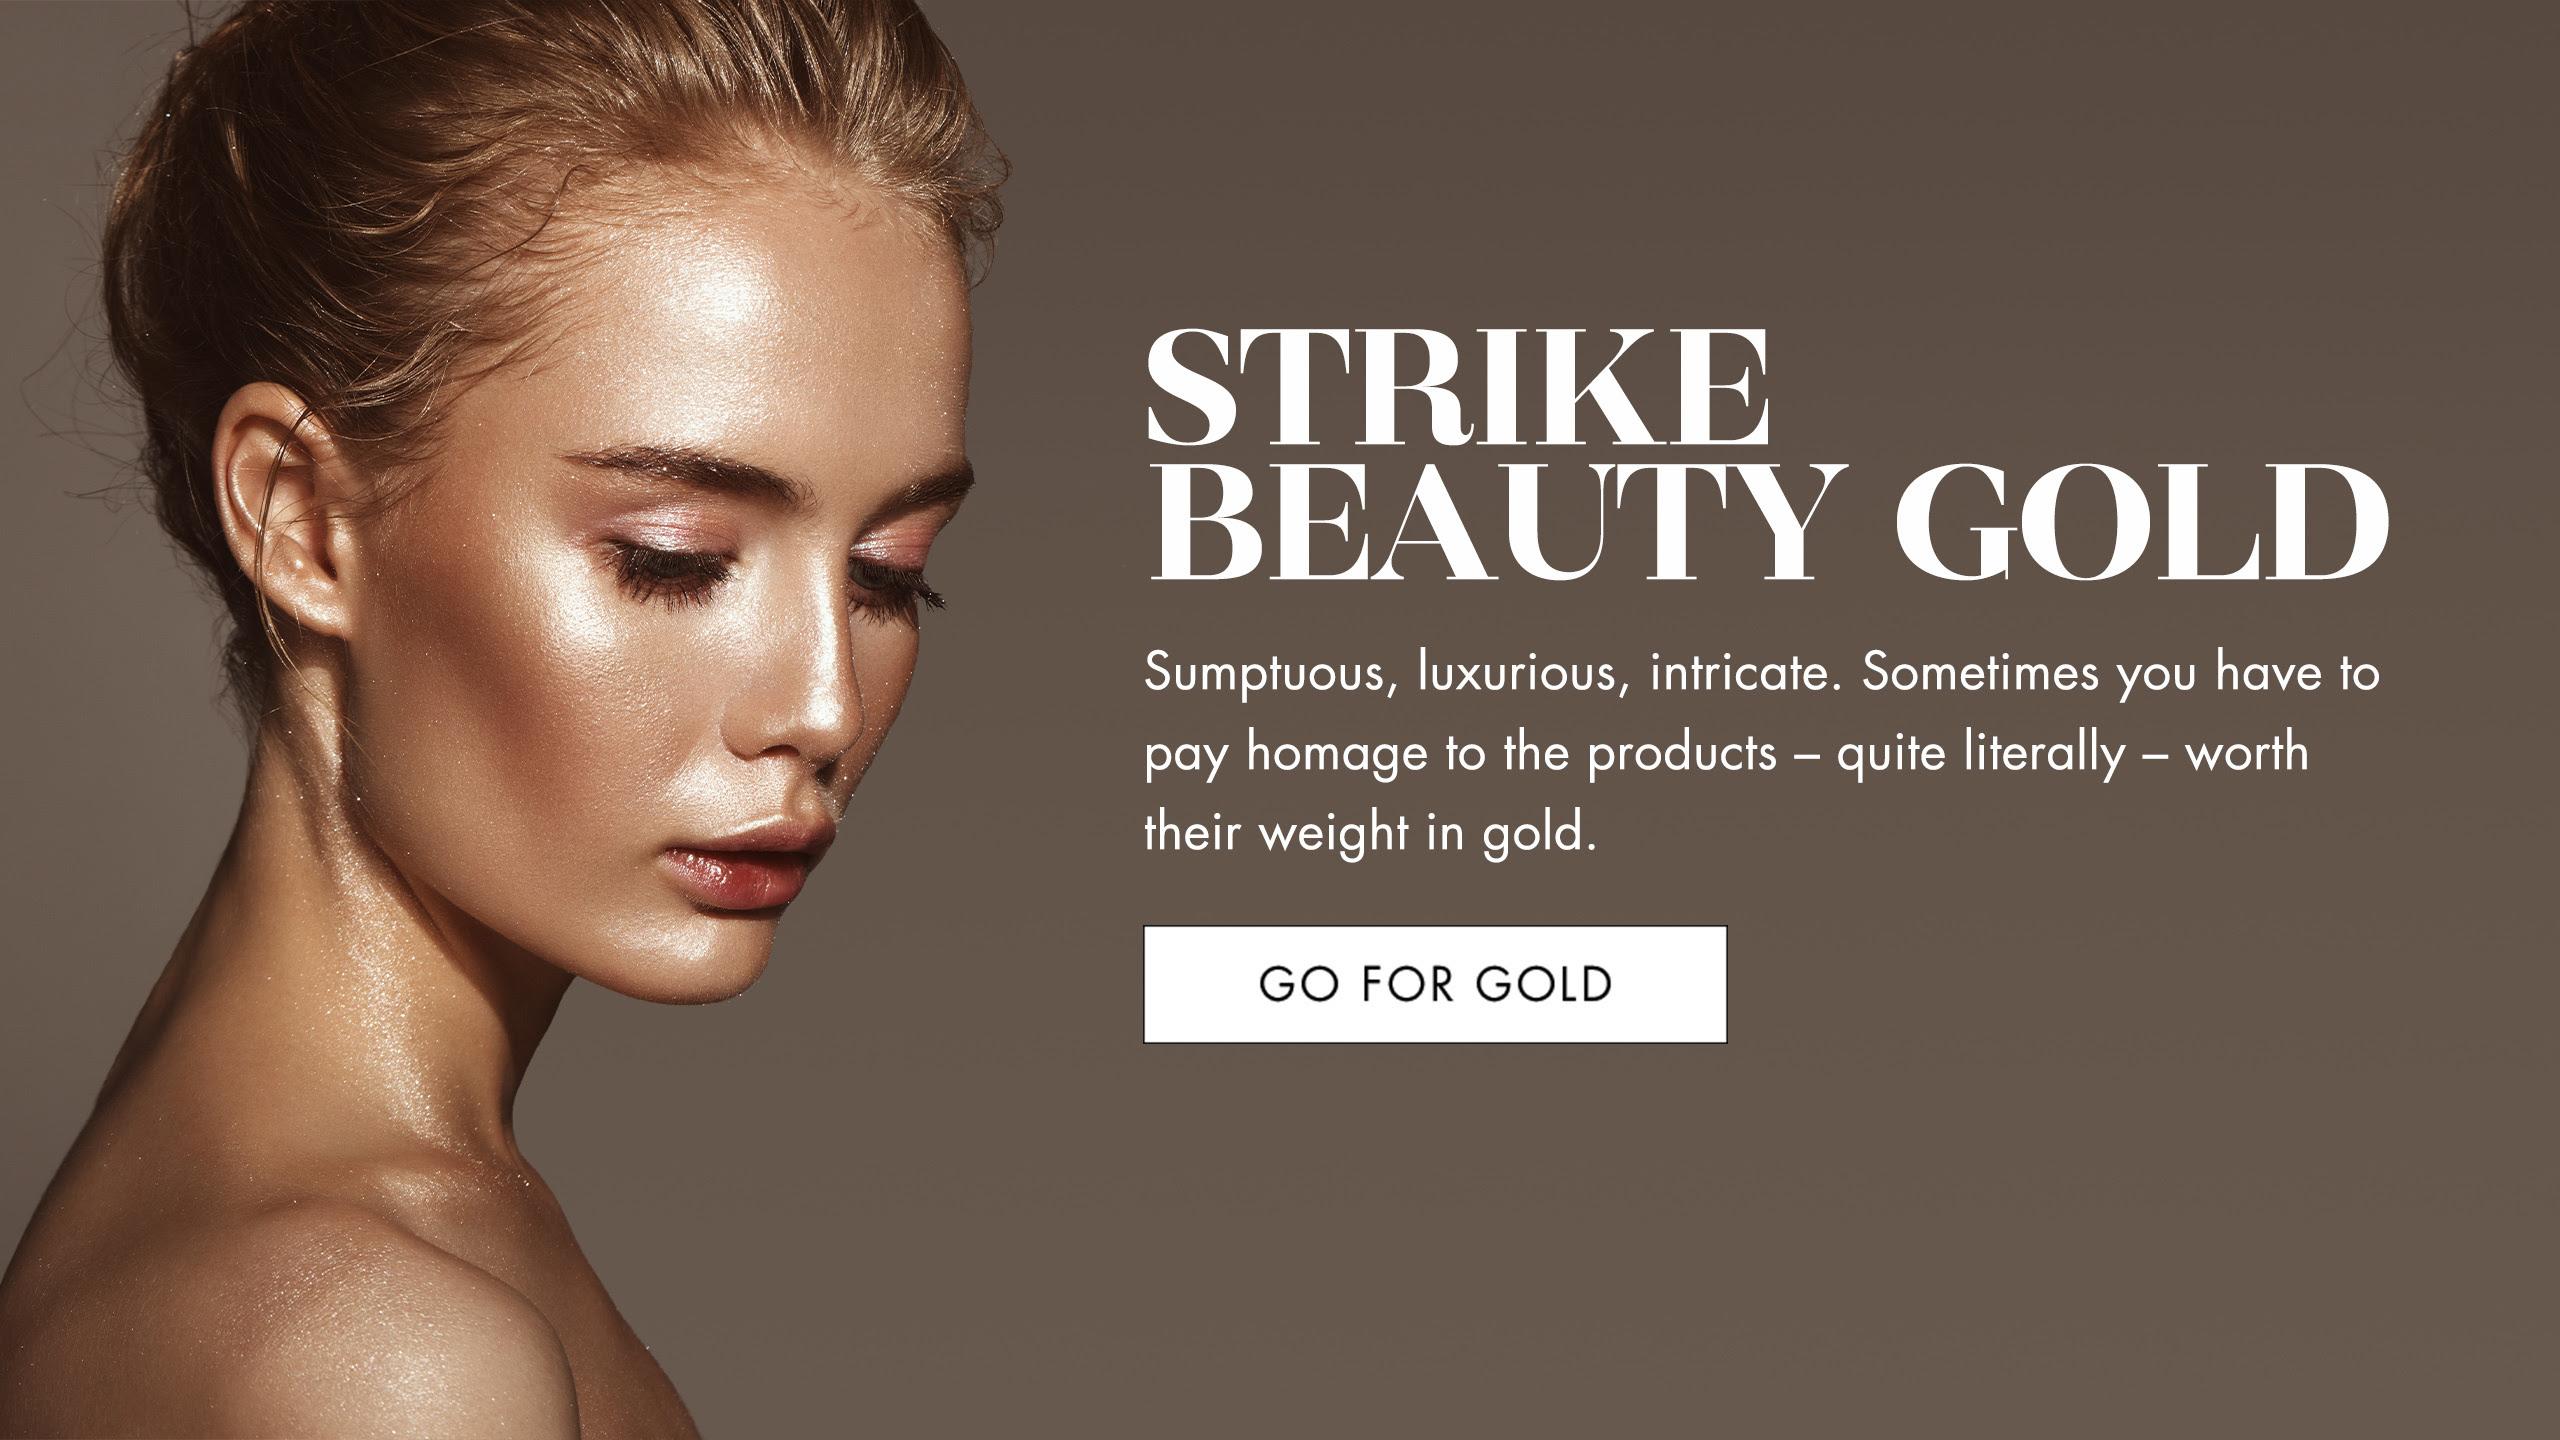 Harvey Nichols - Strike beauty gold